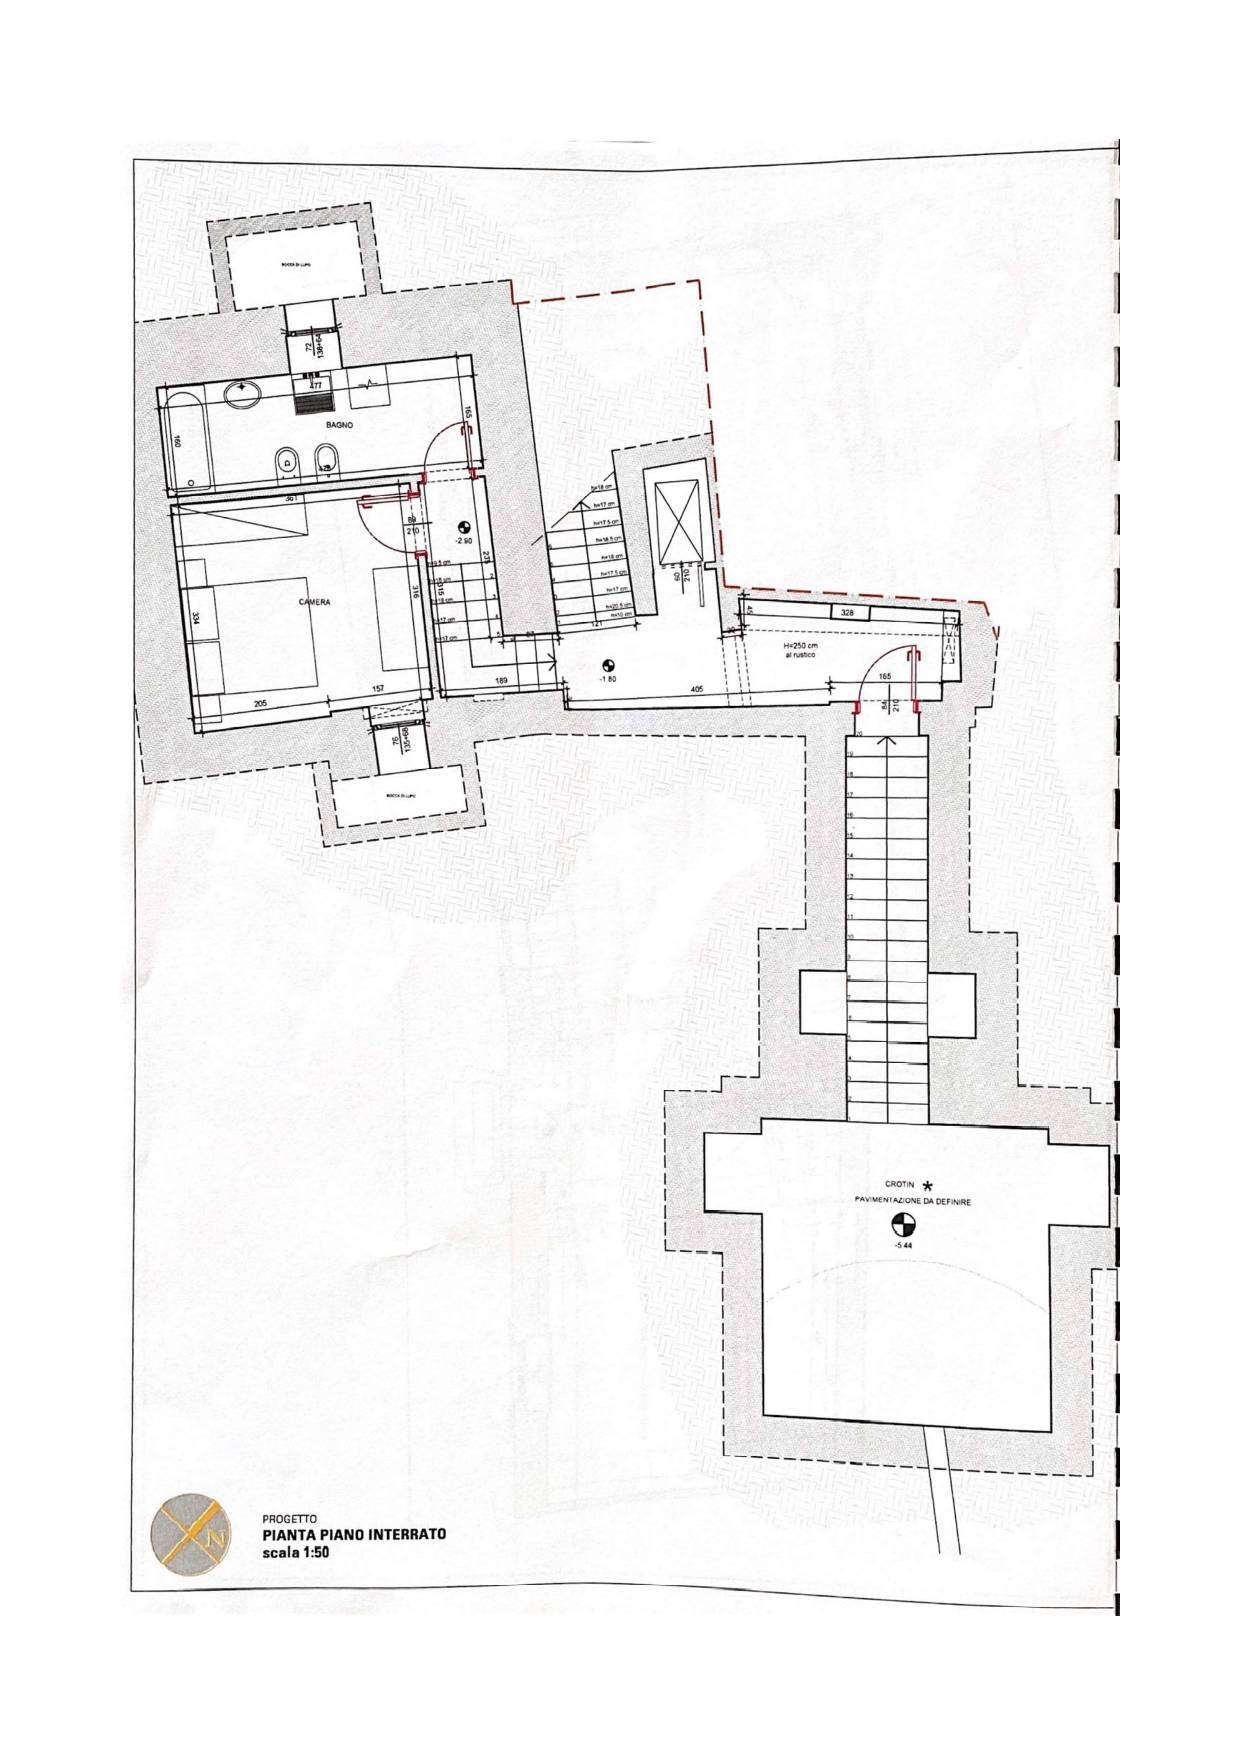 Casa indipendente in Vendita a Torino: 5 locali, 400 mq - Foto 20